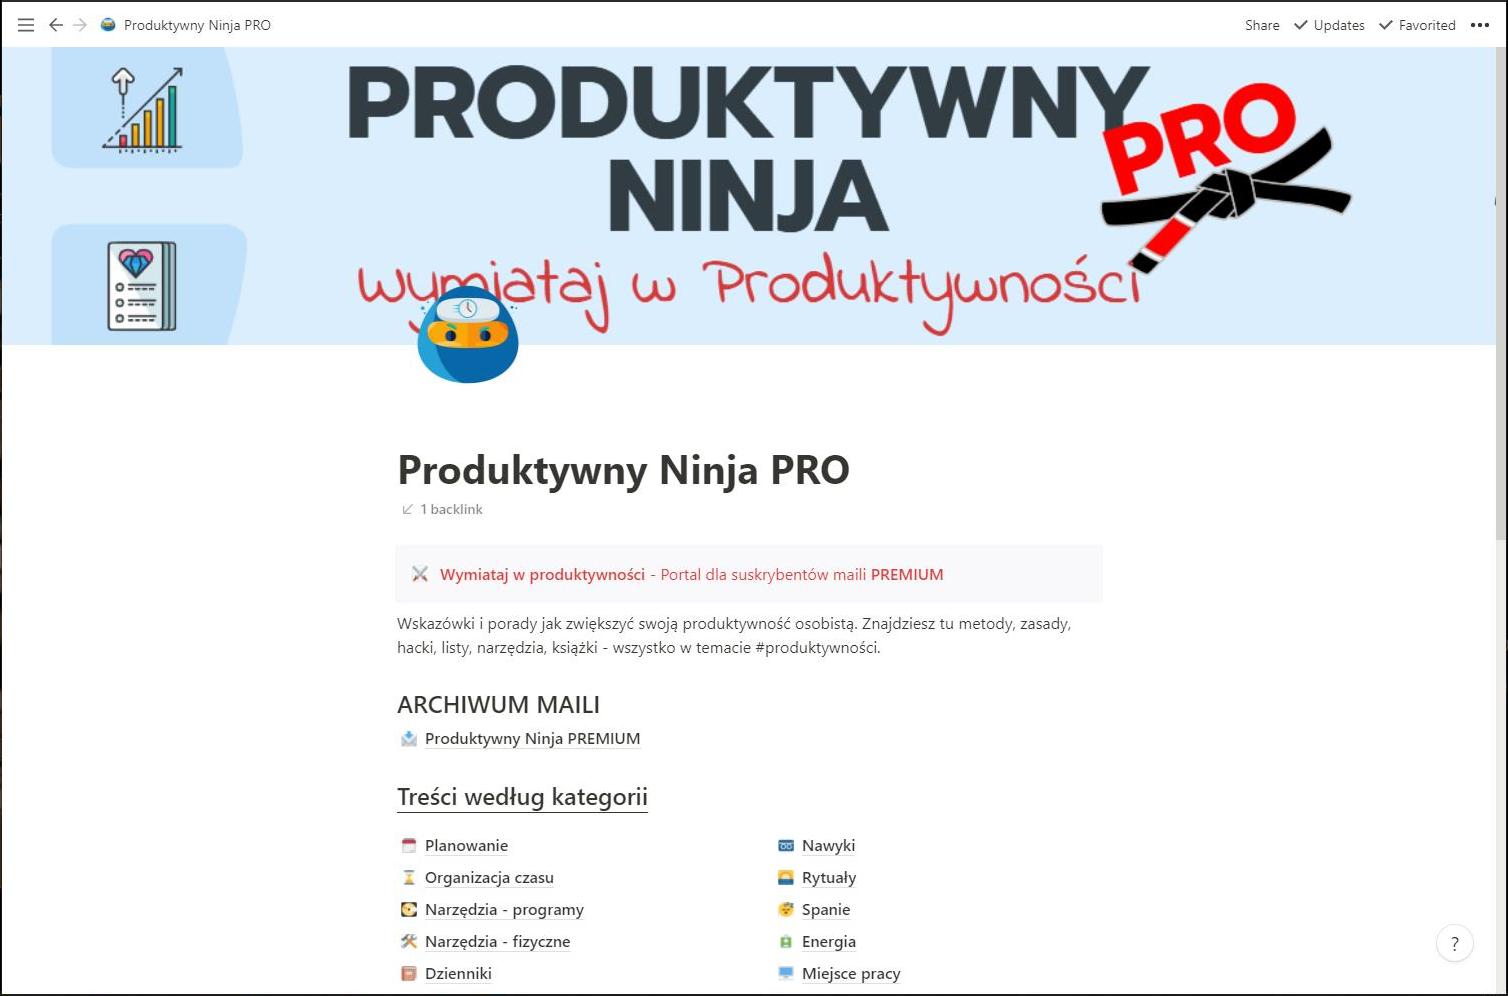 portal Produktywny Ninja PRO